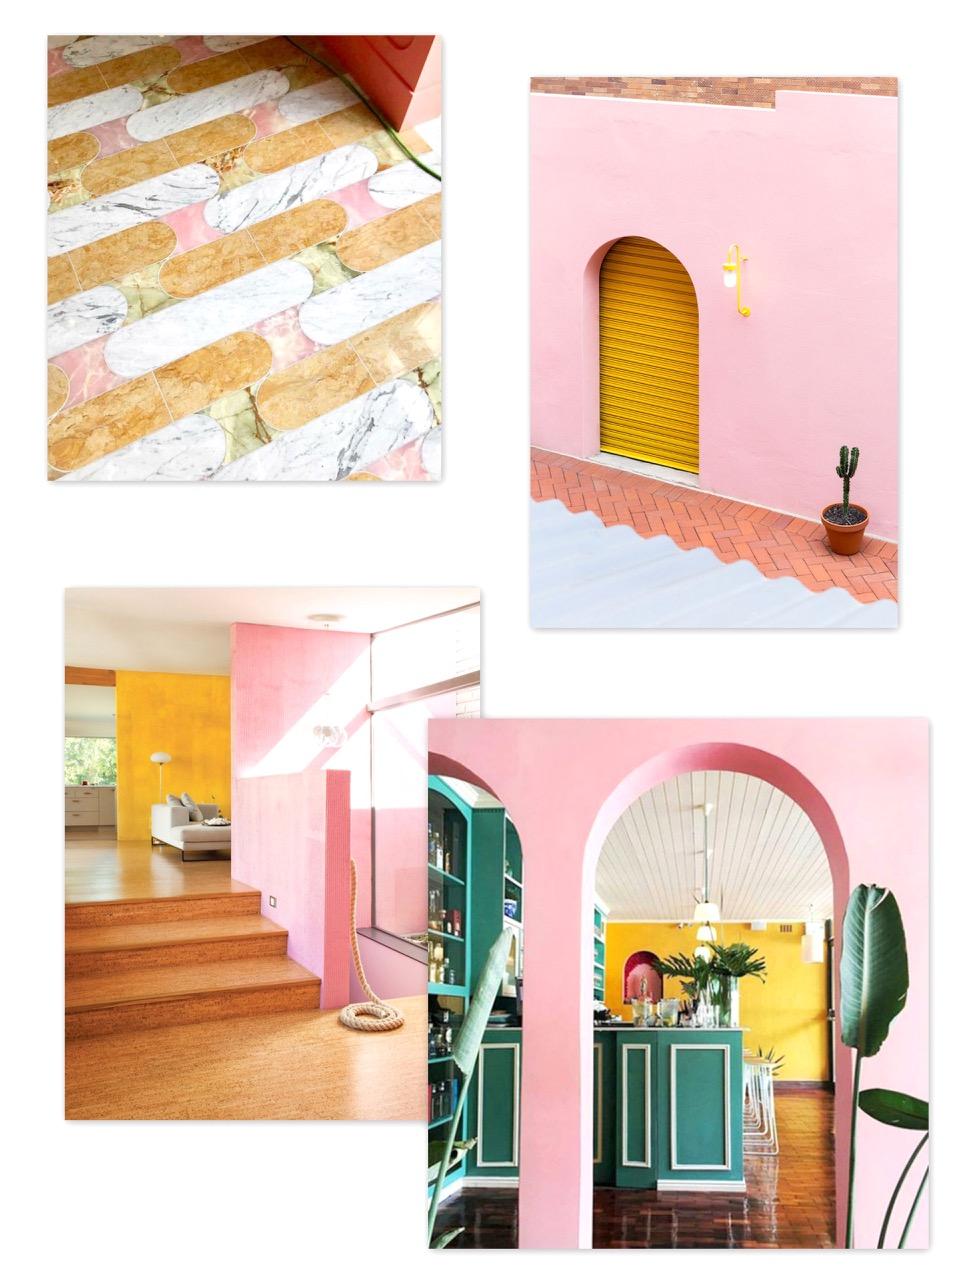 moodboard,inspiration,couleurs,vanille fraise,rose,jaune,sunset,sorbet